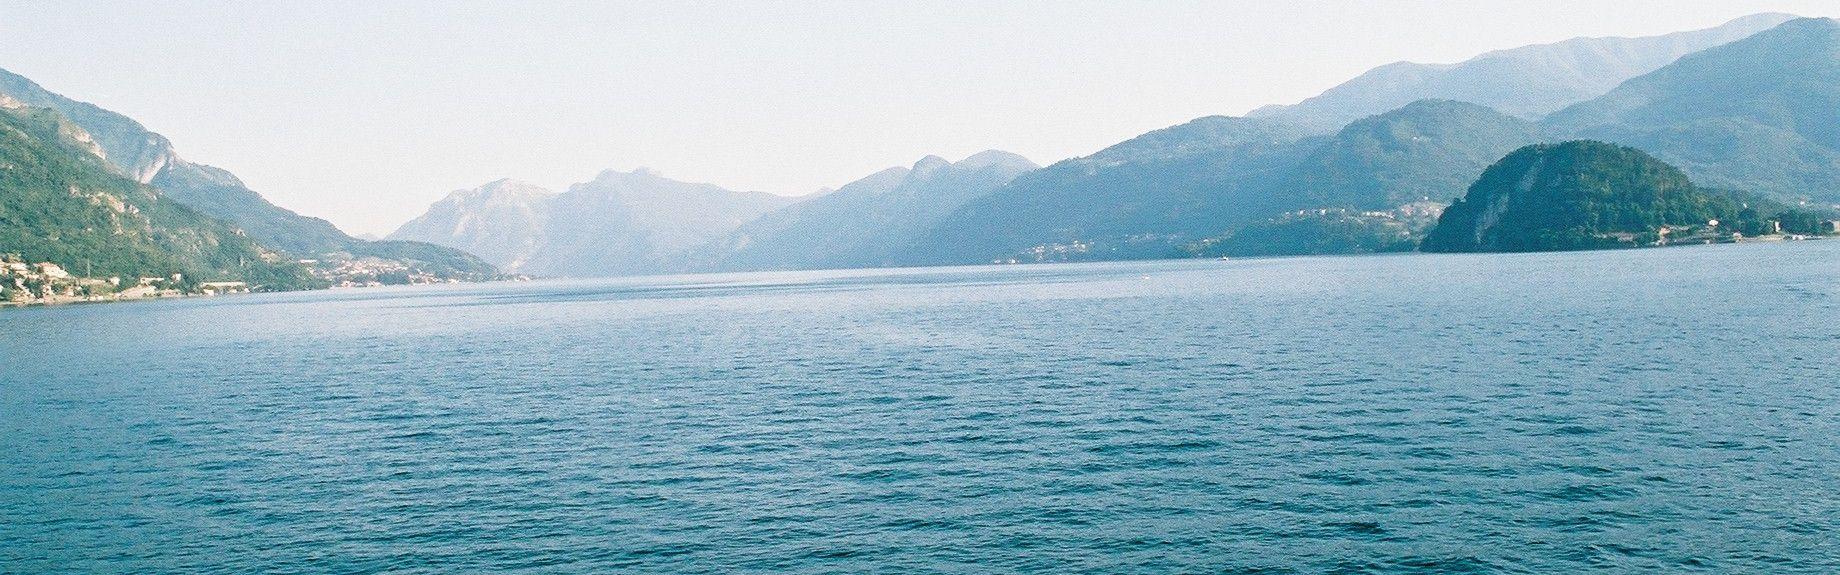 Vendrogno, Lombardije, Italië